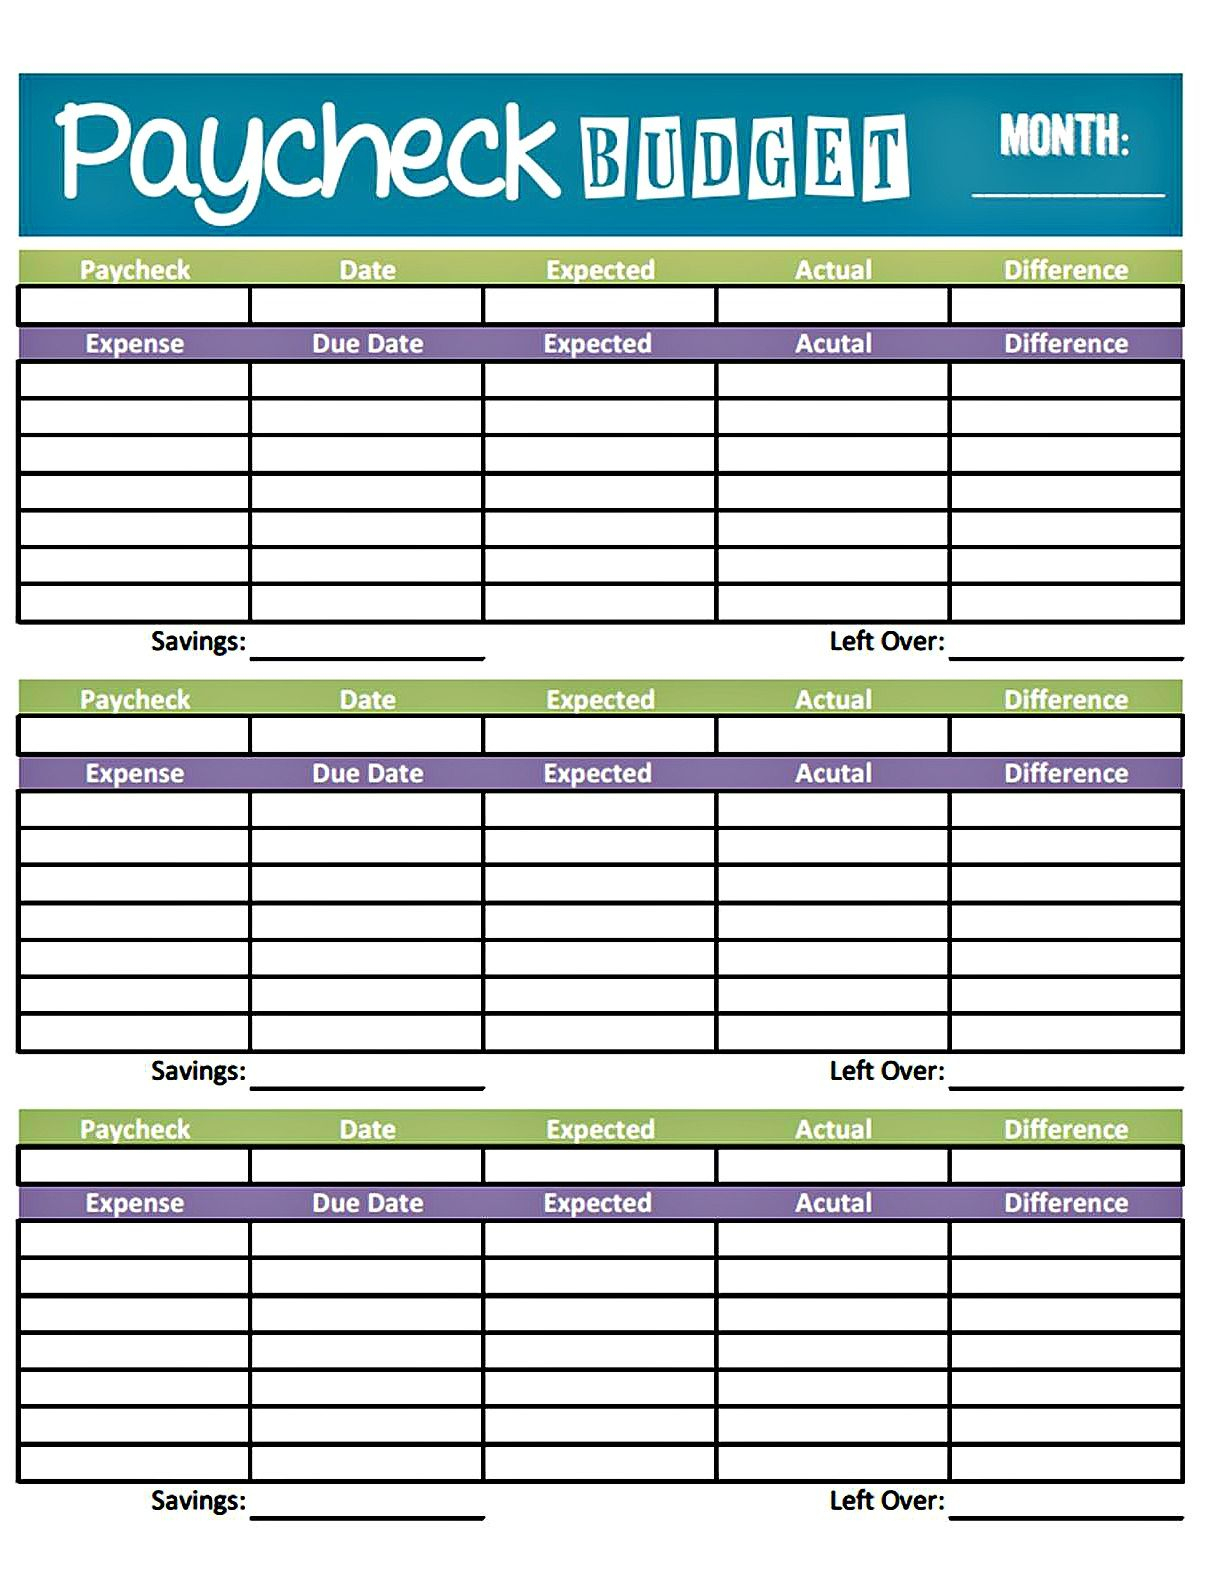 Easy Printable Budget Worksheet | Get Paid Weekly And Charlie Gets | Easy Budget Planner Free Printable Worksheets